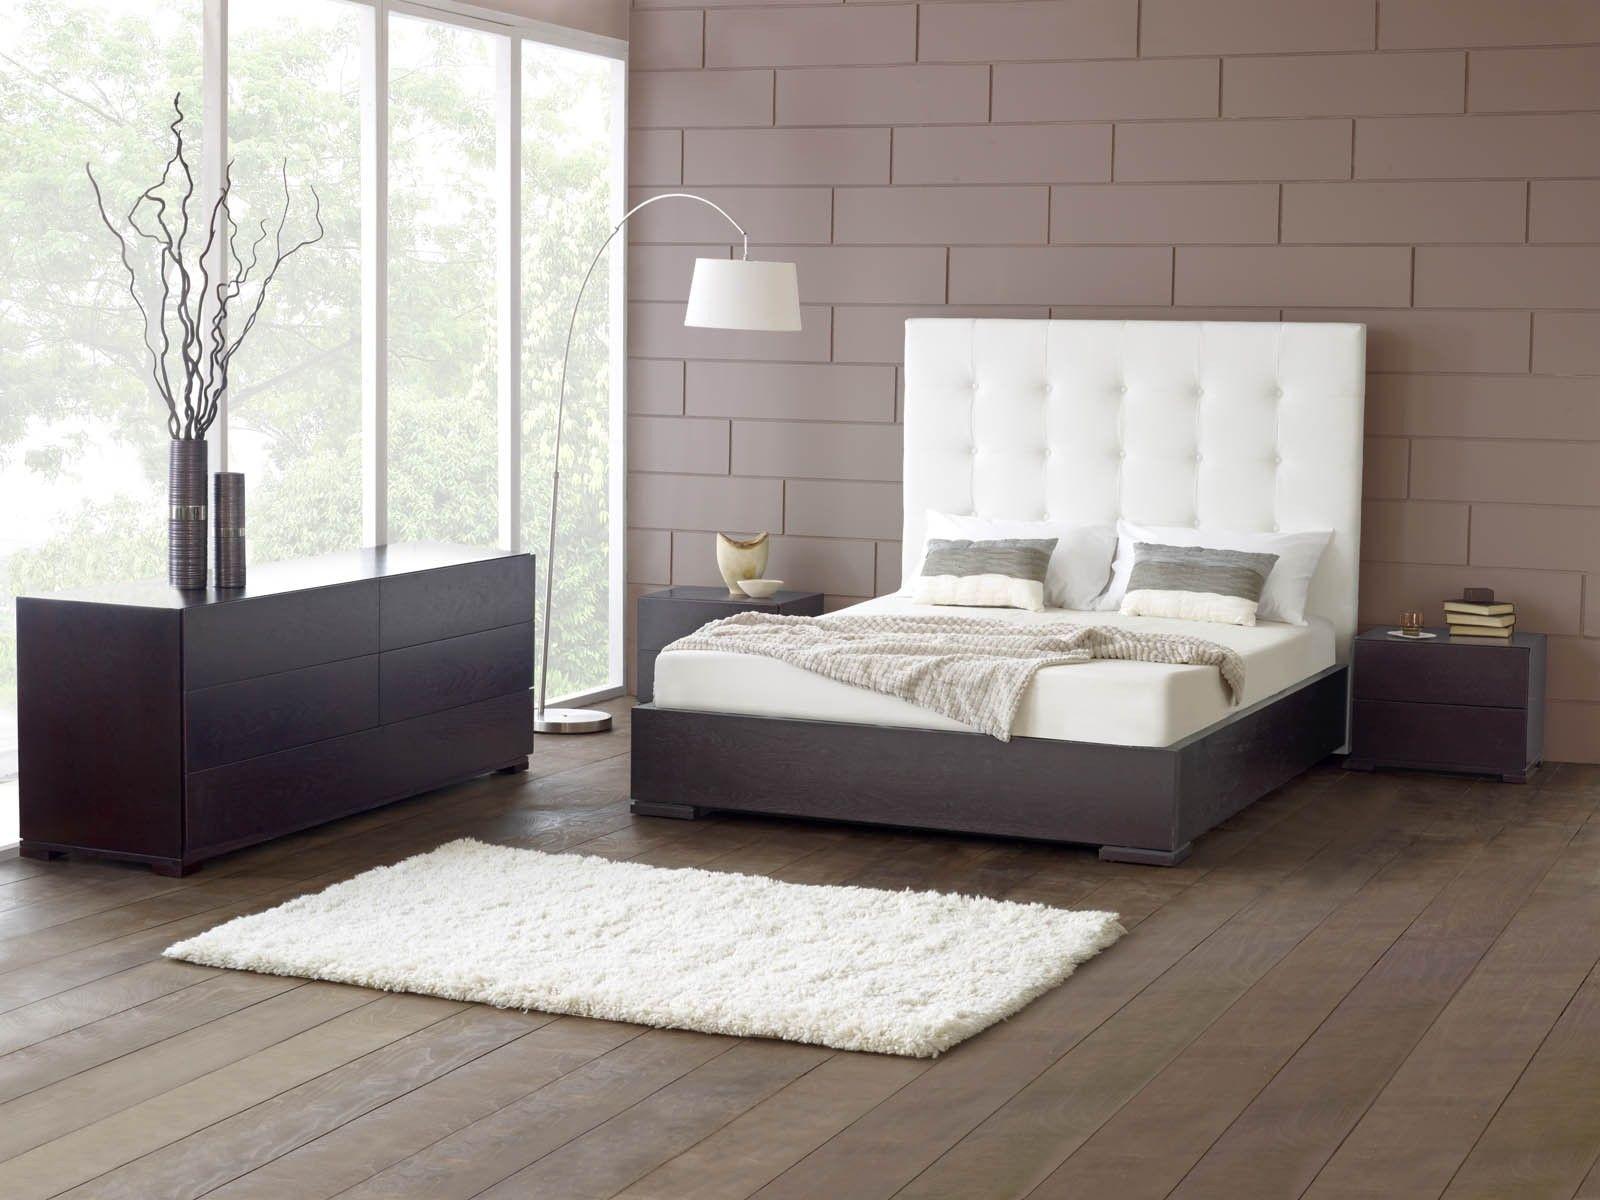 Bedroom interior hd pics modern interior design bedroom  hd wallpapers background in